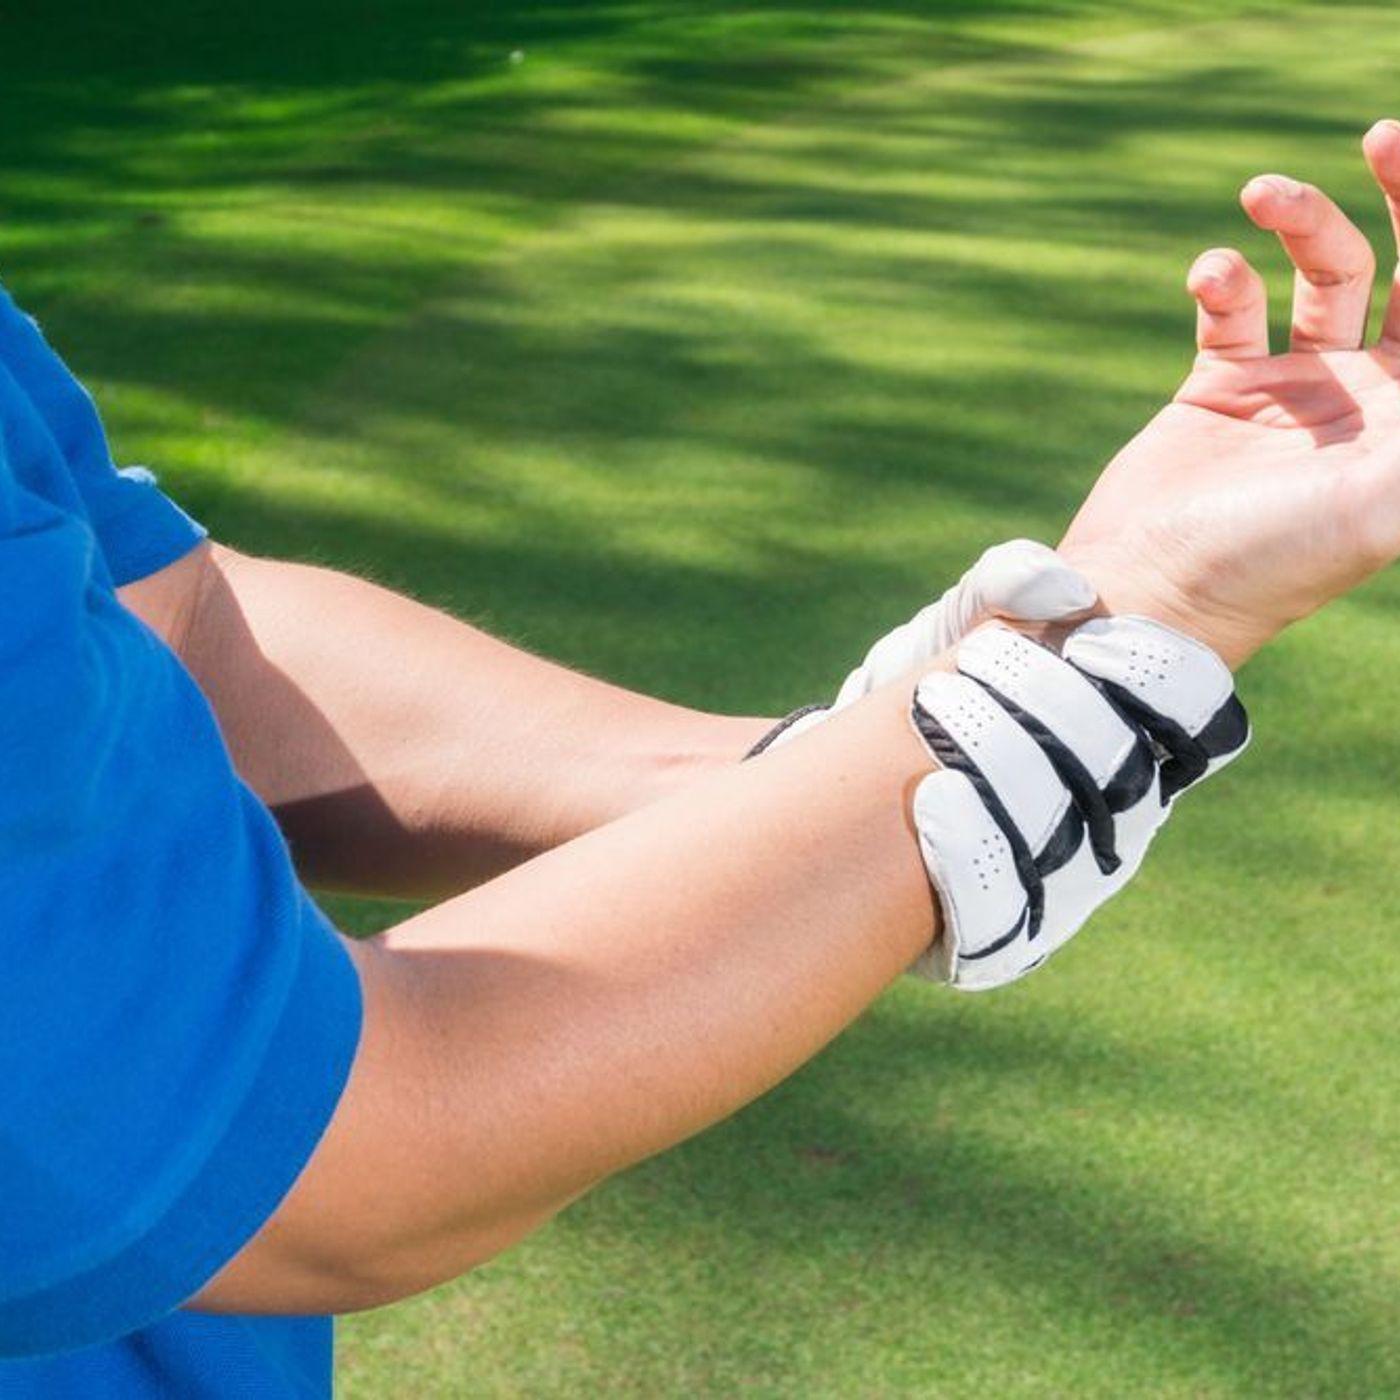 Ep. 5: Dr. John Fernandez from Rush: Managing Hand Injuries